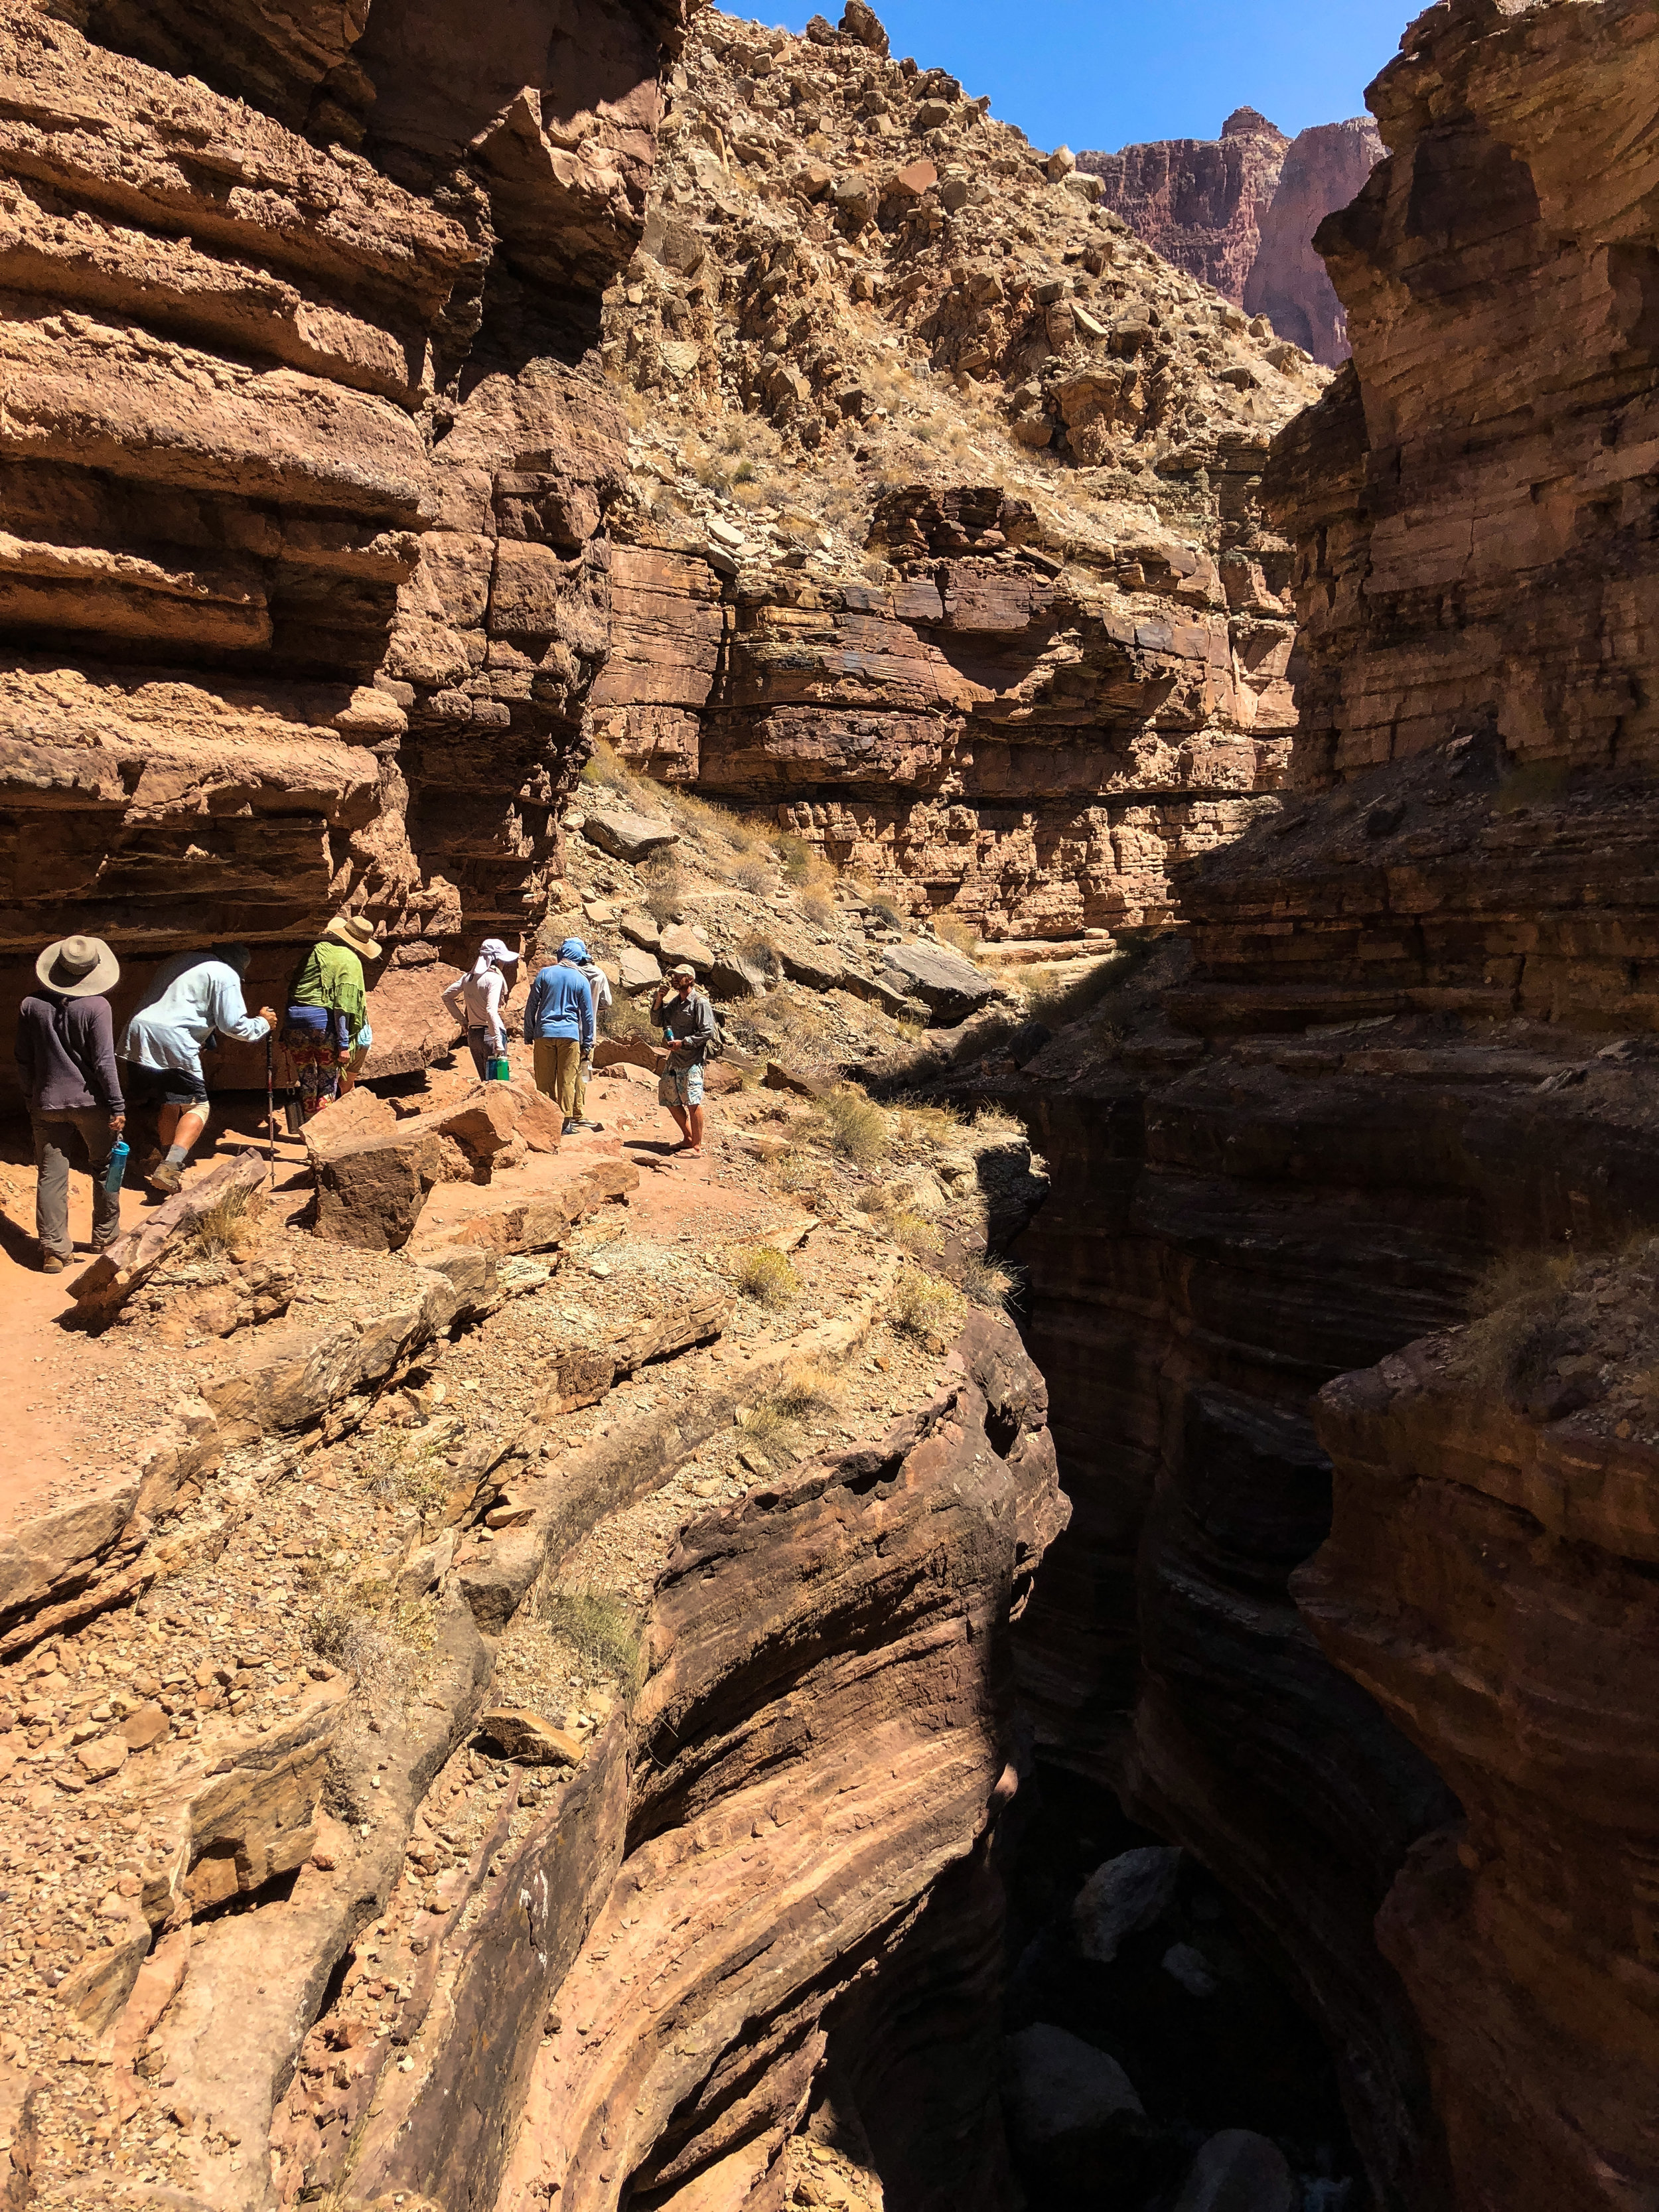 Narrow trail along the slot canyon of Deer Creek